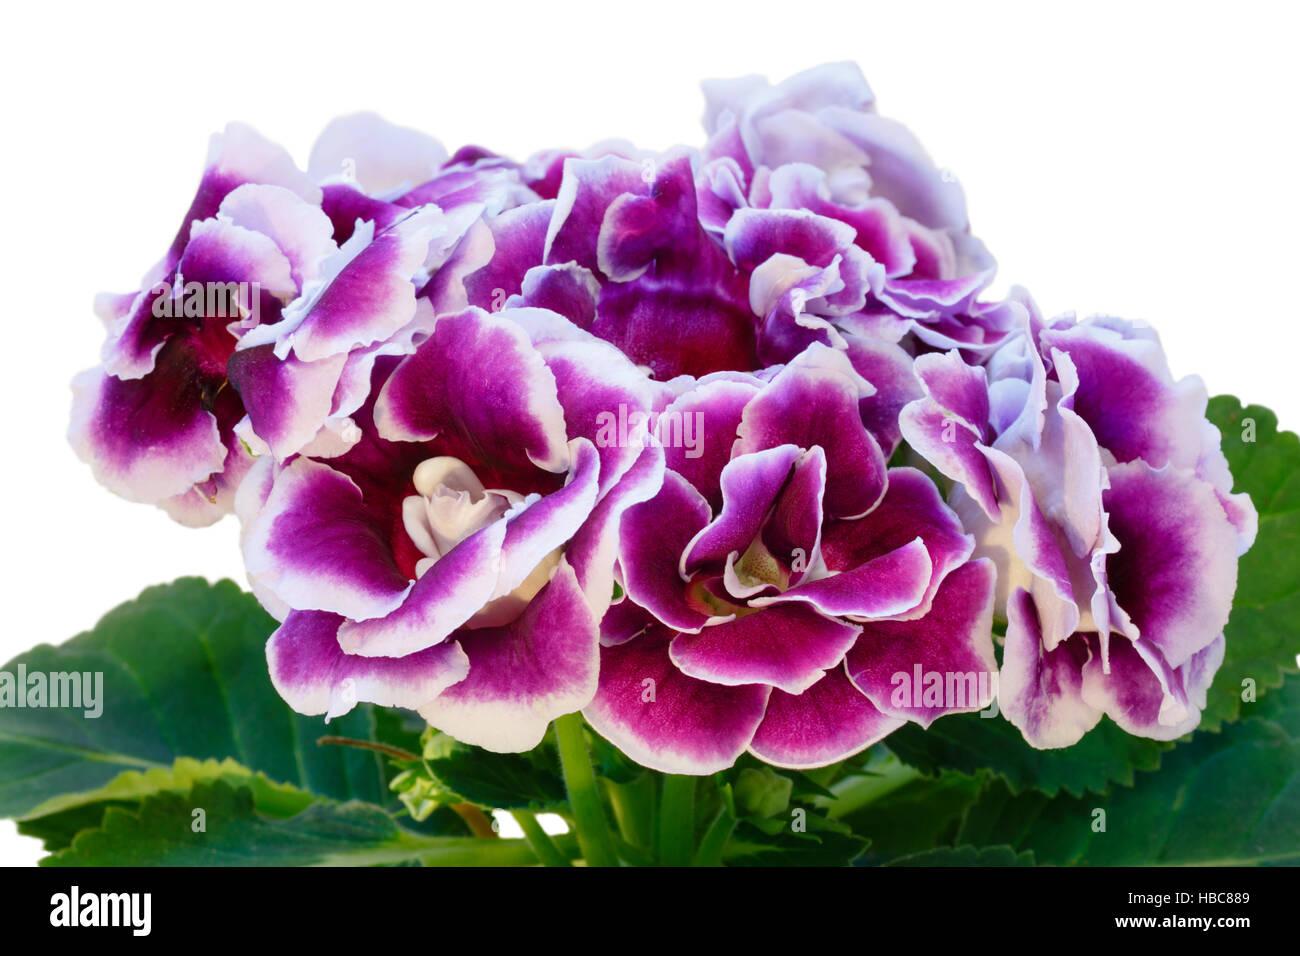 Gloxinia Plant With Violet White Flowers Stock Photo 127503721 Alamy